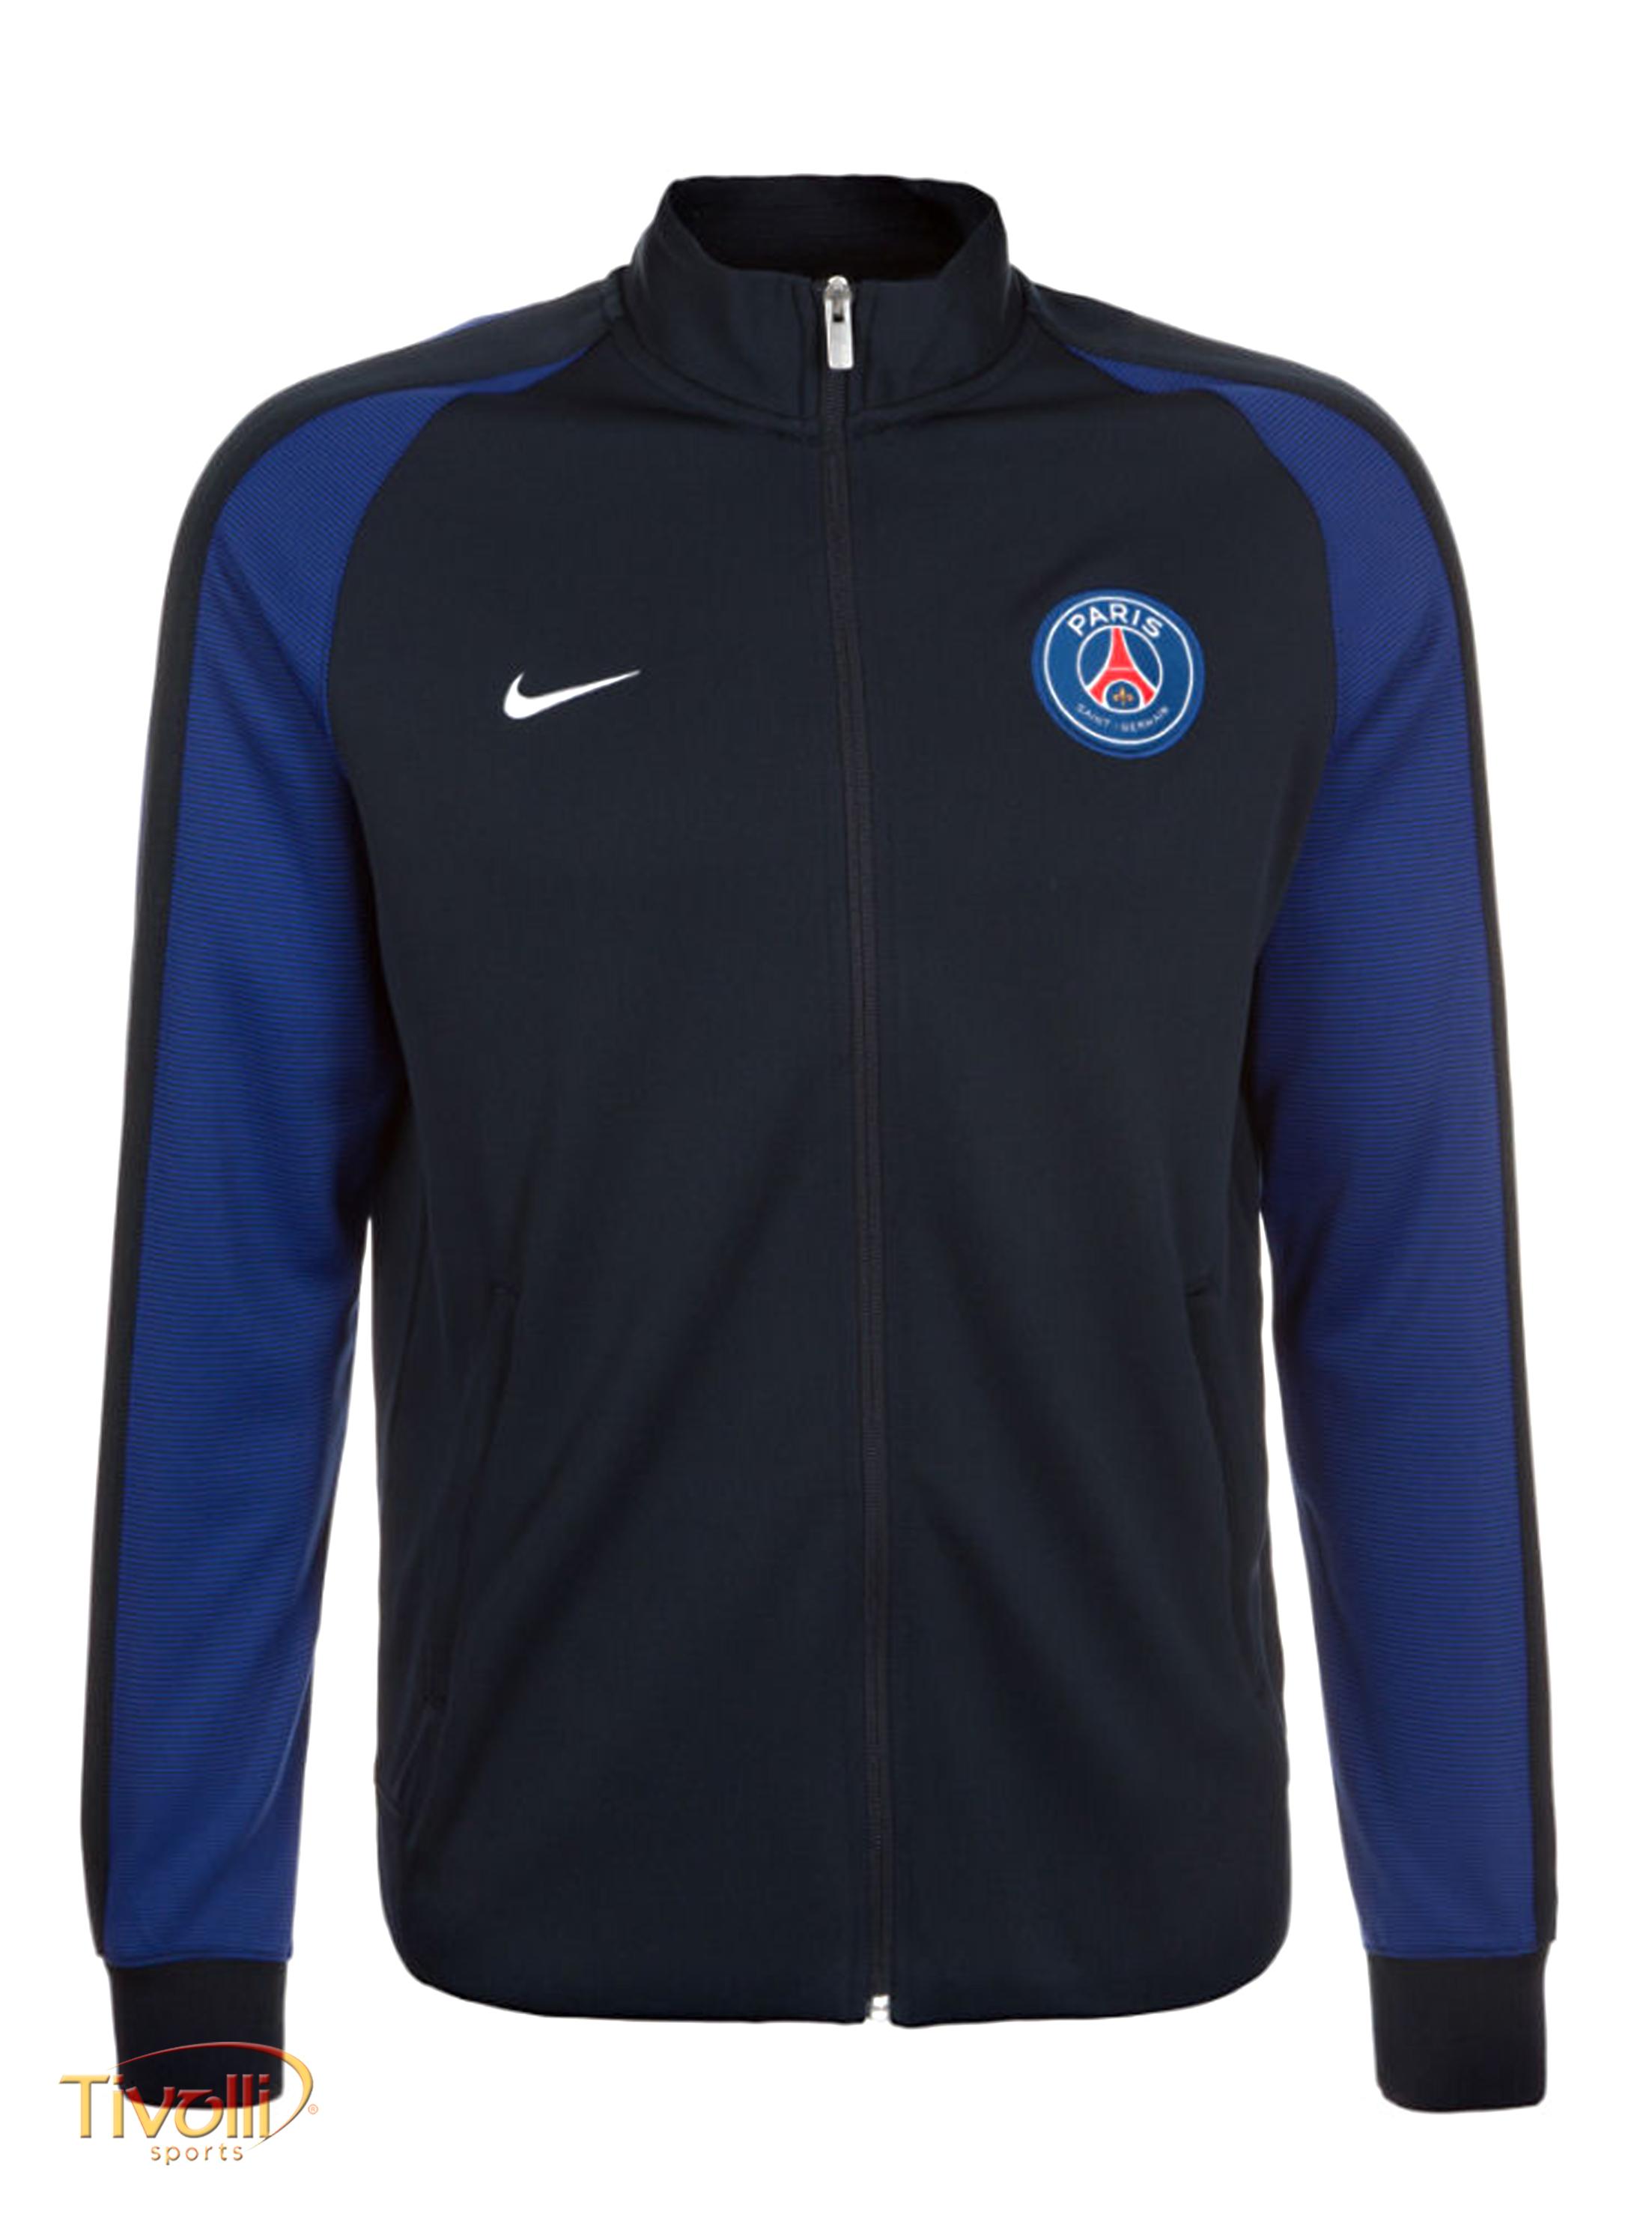 5282e92098 Jaqueta Paris Saint-Germain Authentic N98 Nike 2016 2017 PSG Masculina  Preta e Azul Marinho